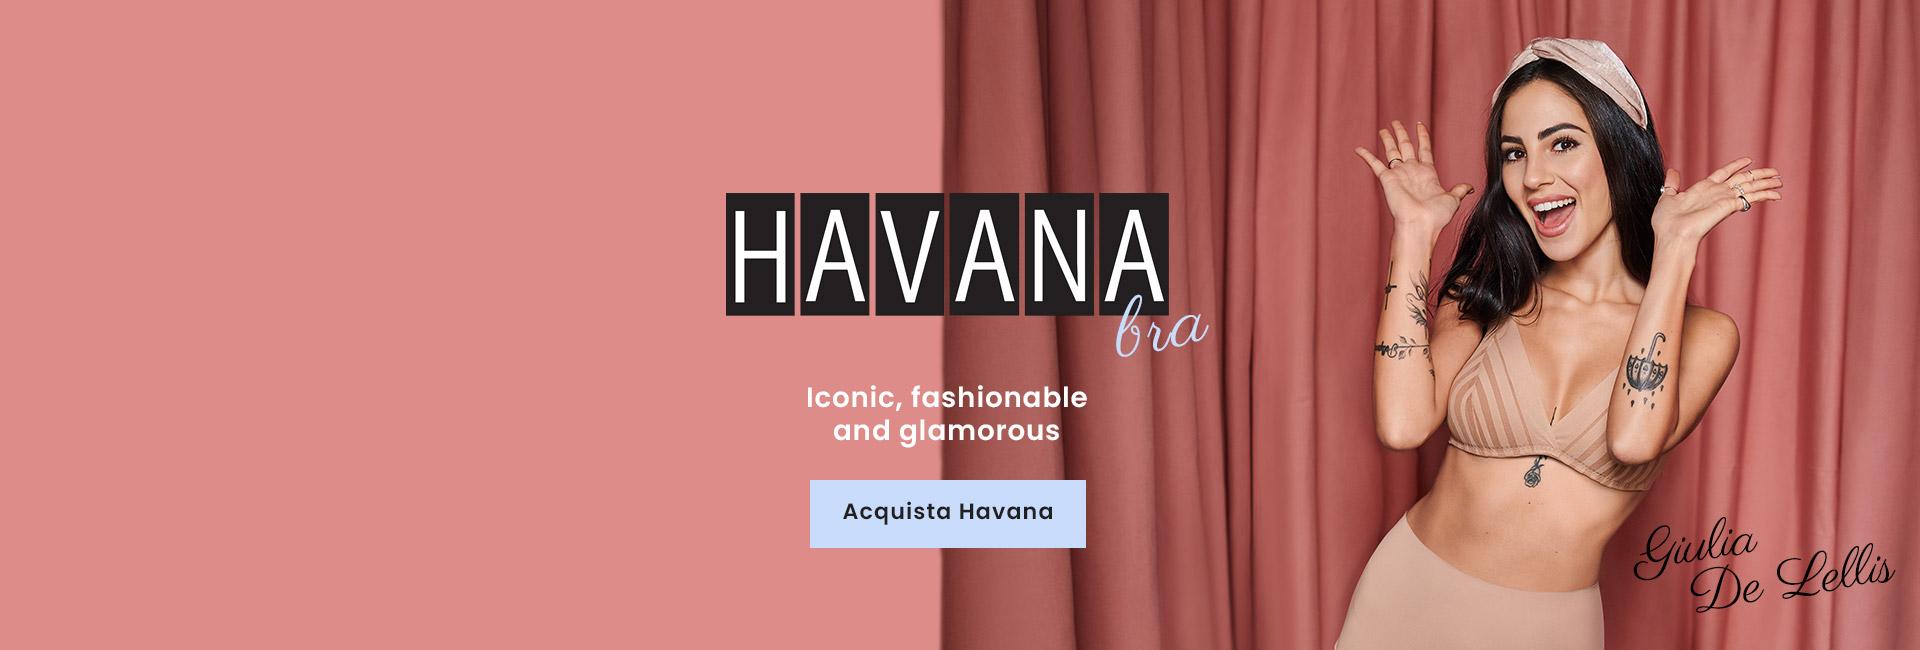 HAVANA, the bra revolution